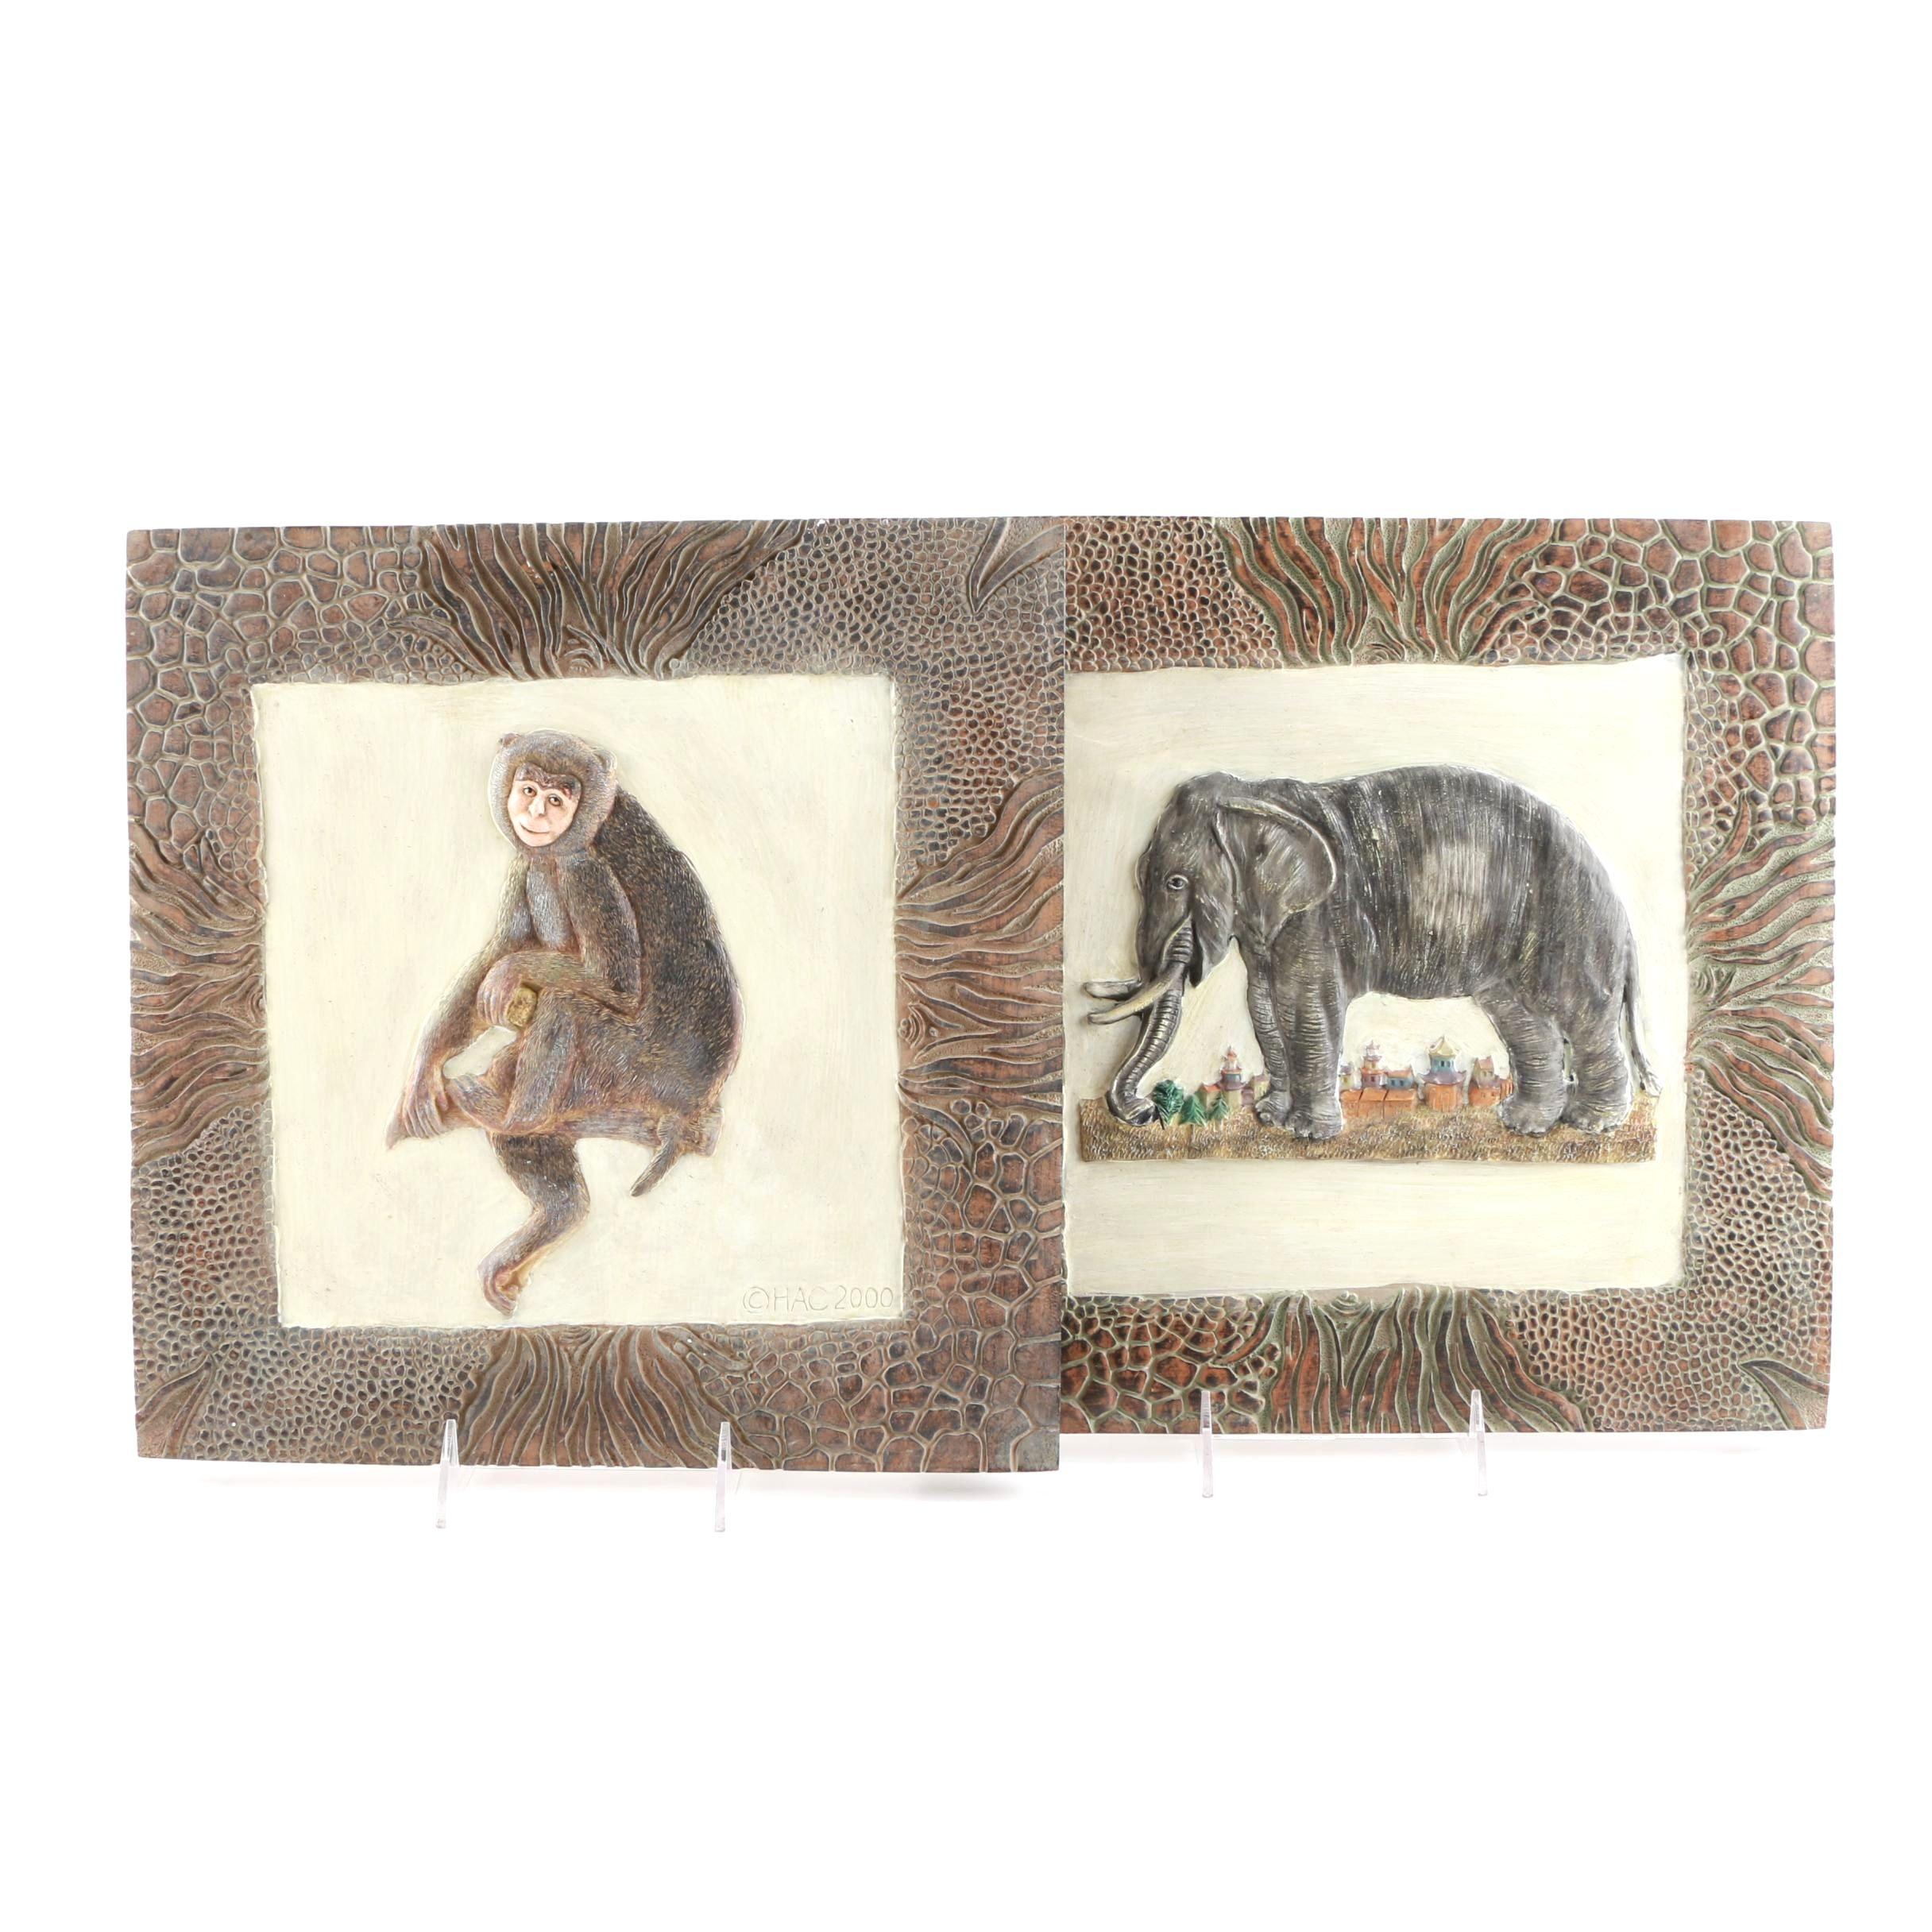 Elephant and Monkey Themed Wall Art